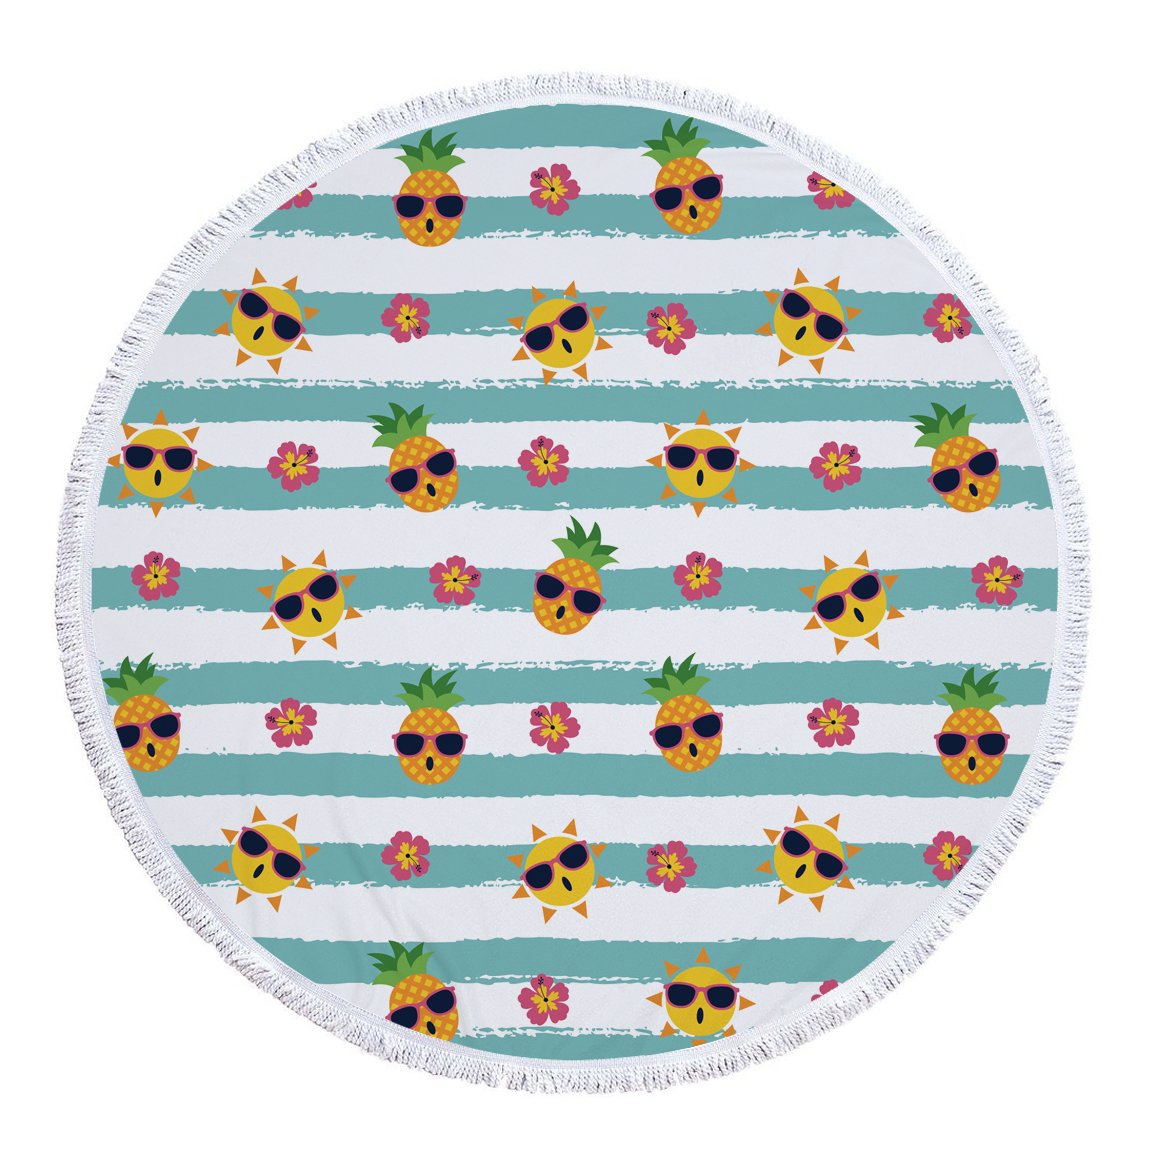 naturalshow Indian MandalaマイクロファイバーLarge Round Beach Blanket with Tassels超ソフトスーパー水吸収性多目的タオル59インチAcross 150*150 CM dm6030 B072BN5J9P 150*150 CM|Bohemian Blue Bohemian Blue 150*150 CM